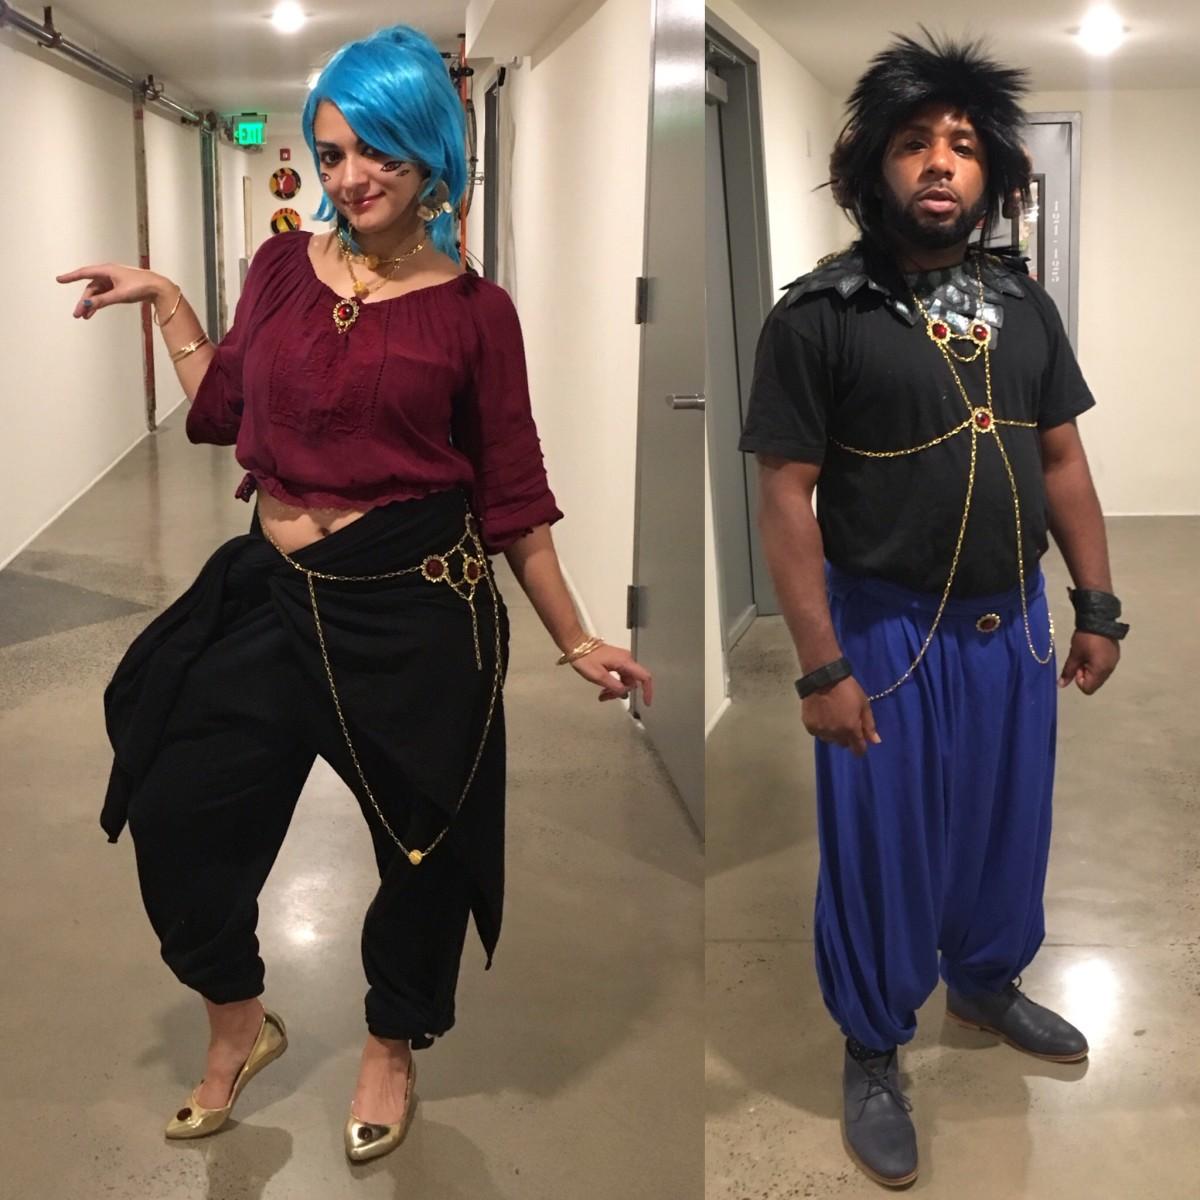 Djinn outfits